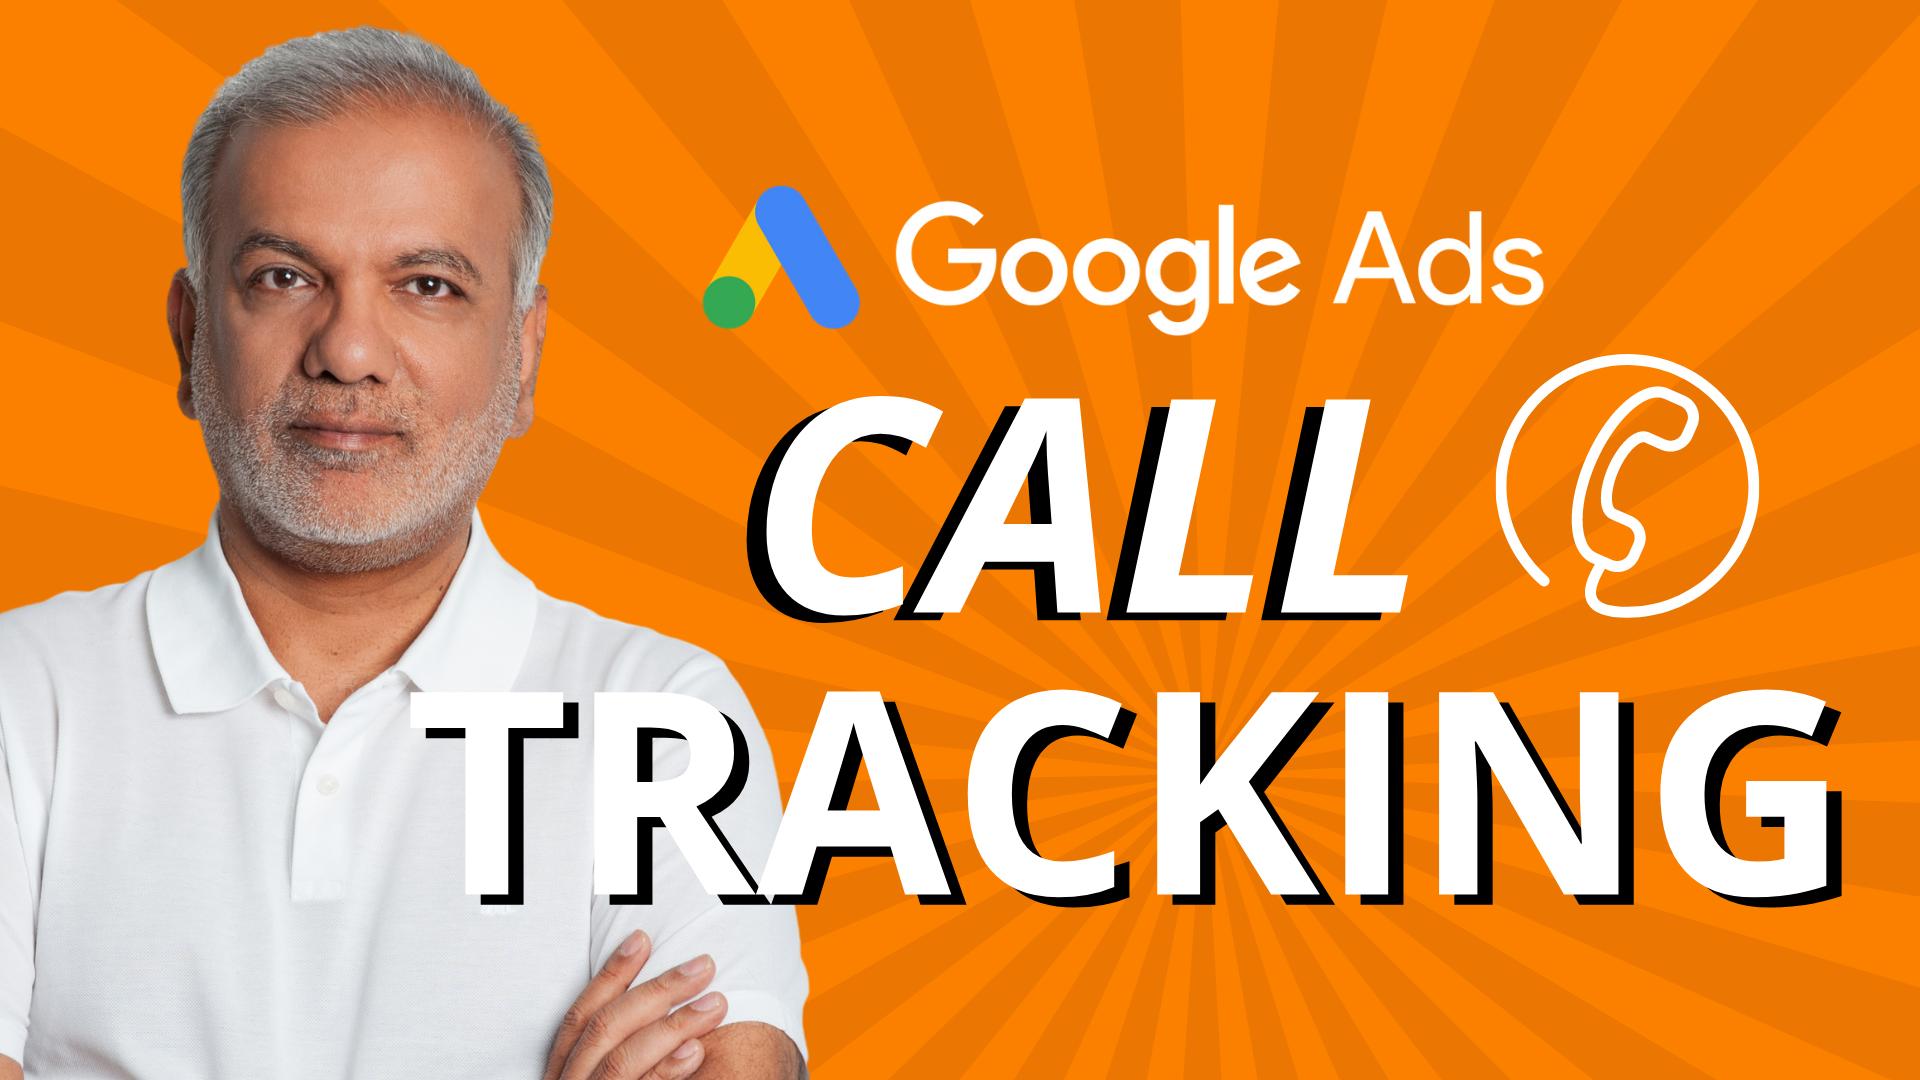 How to Setup Call Tracking on Google Ads